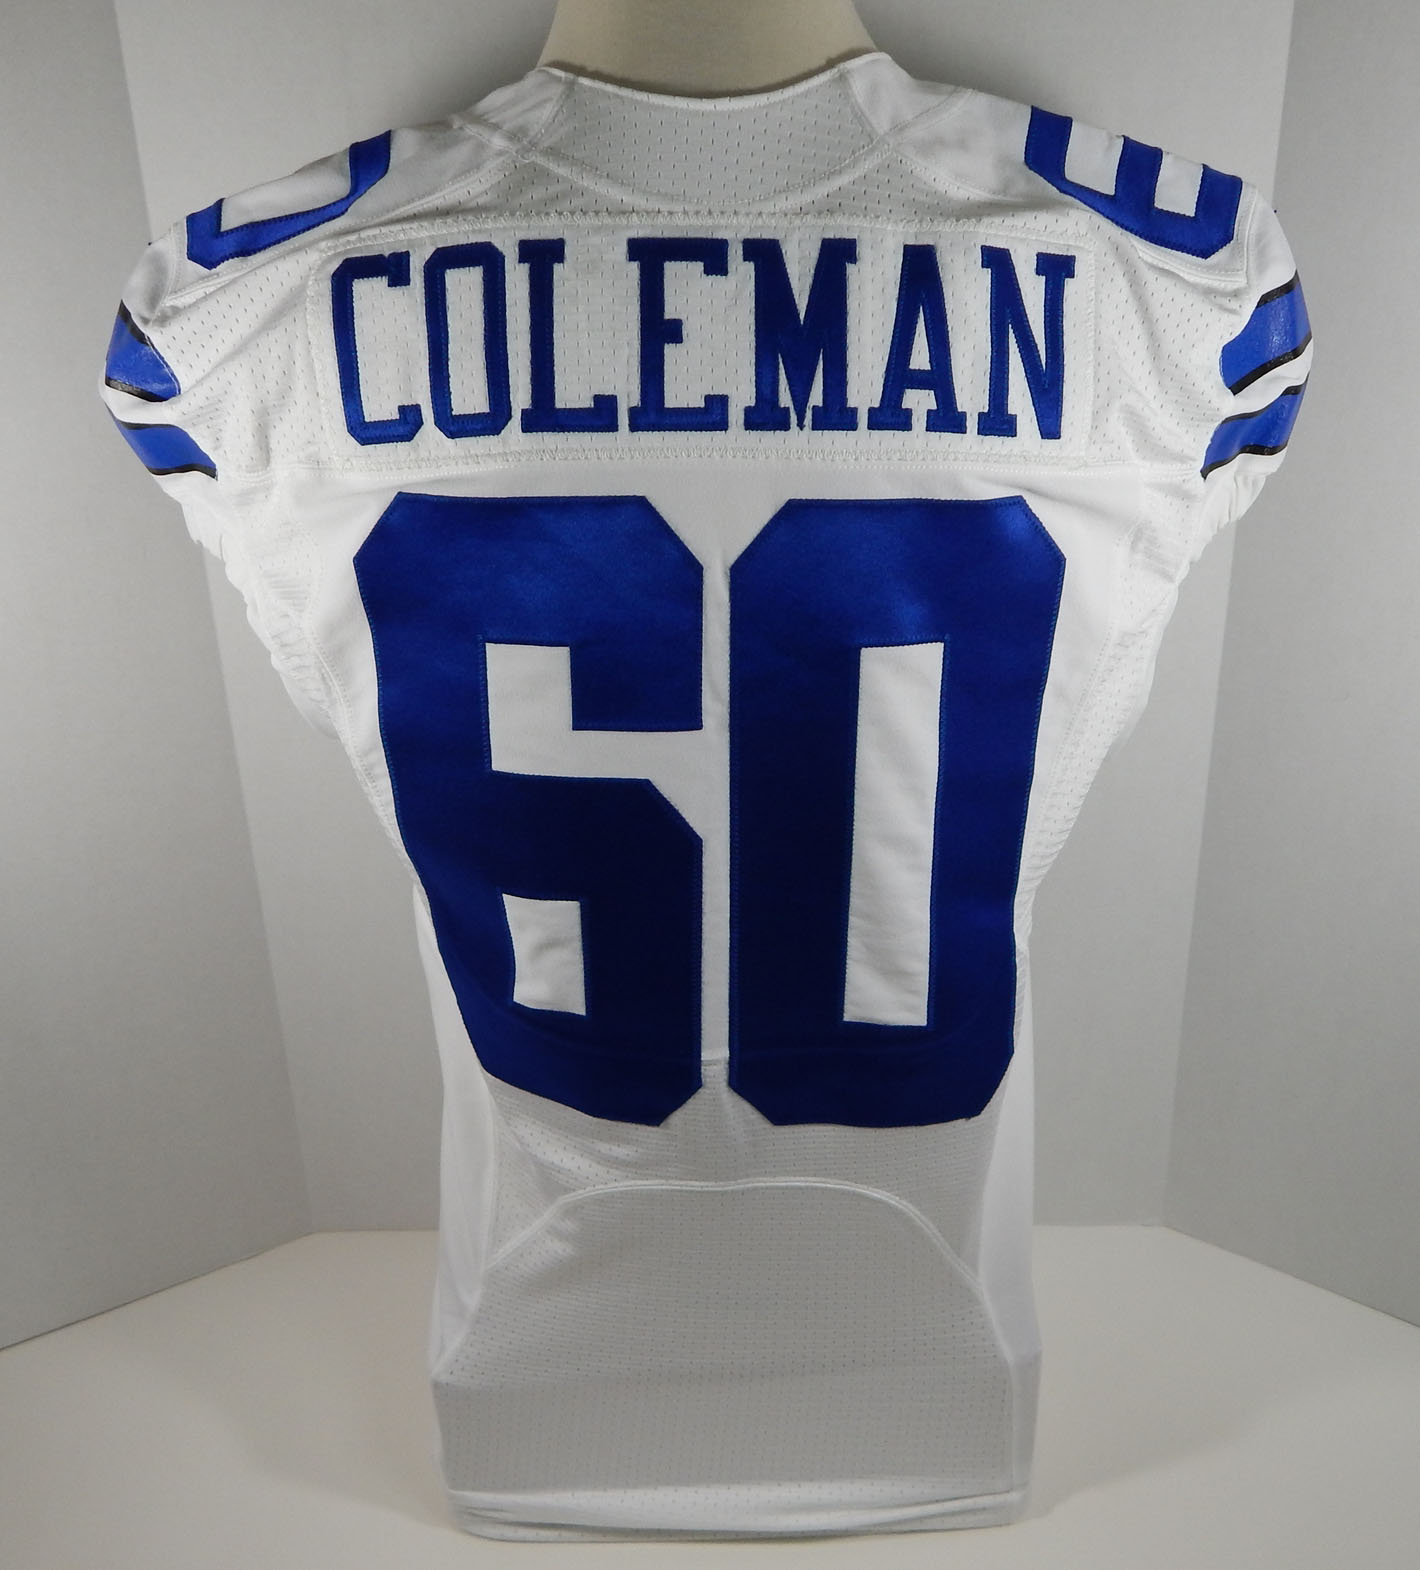 2015 Dallas Cowboys Davon Coleman #60 Game Issued White Jersey   eBay